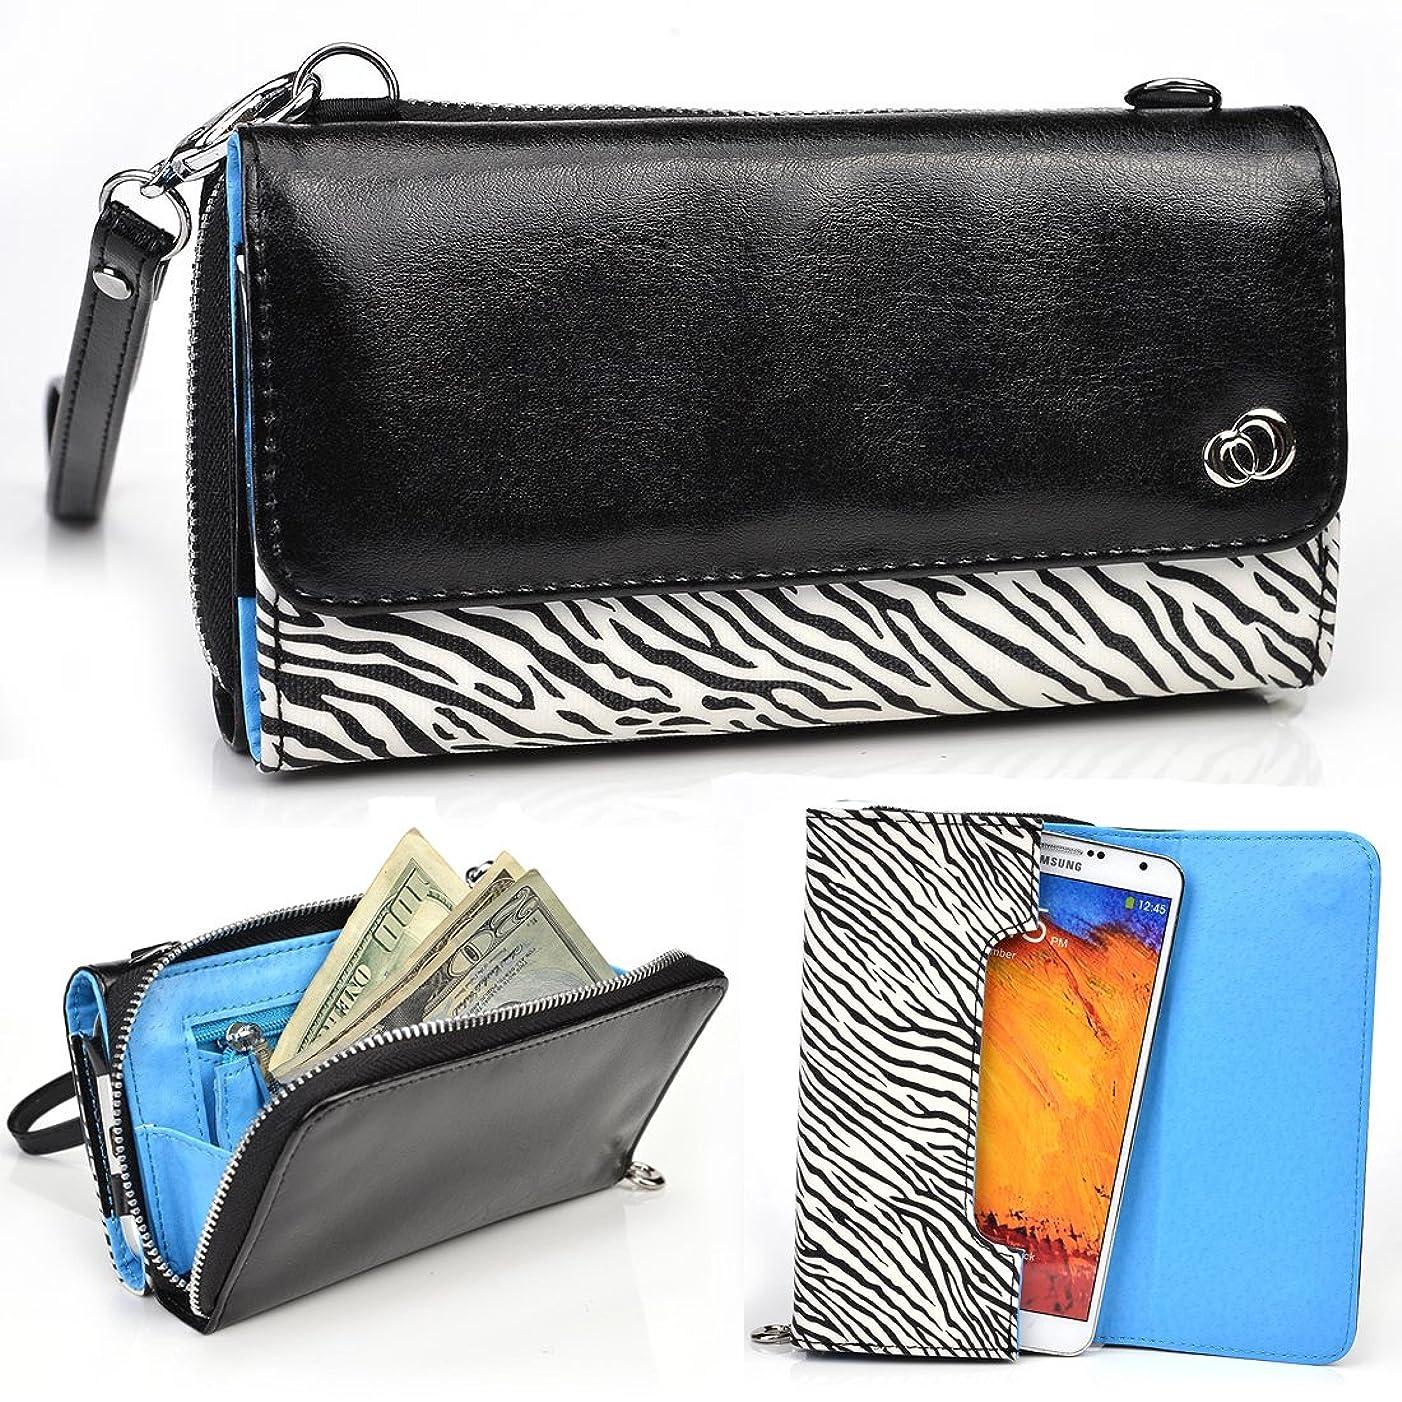 Kroo Zebra Blend Universal Cross-Body Wallet Case for Sky Devices 5.0S, Elite 5.0L 5.0LW, Platinum 5.0Q 5.0W, FUEGO 5.5D 5.0